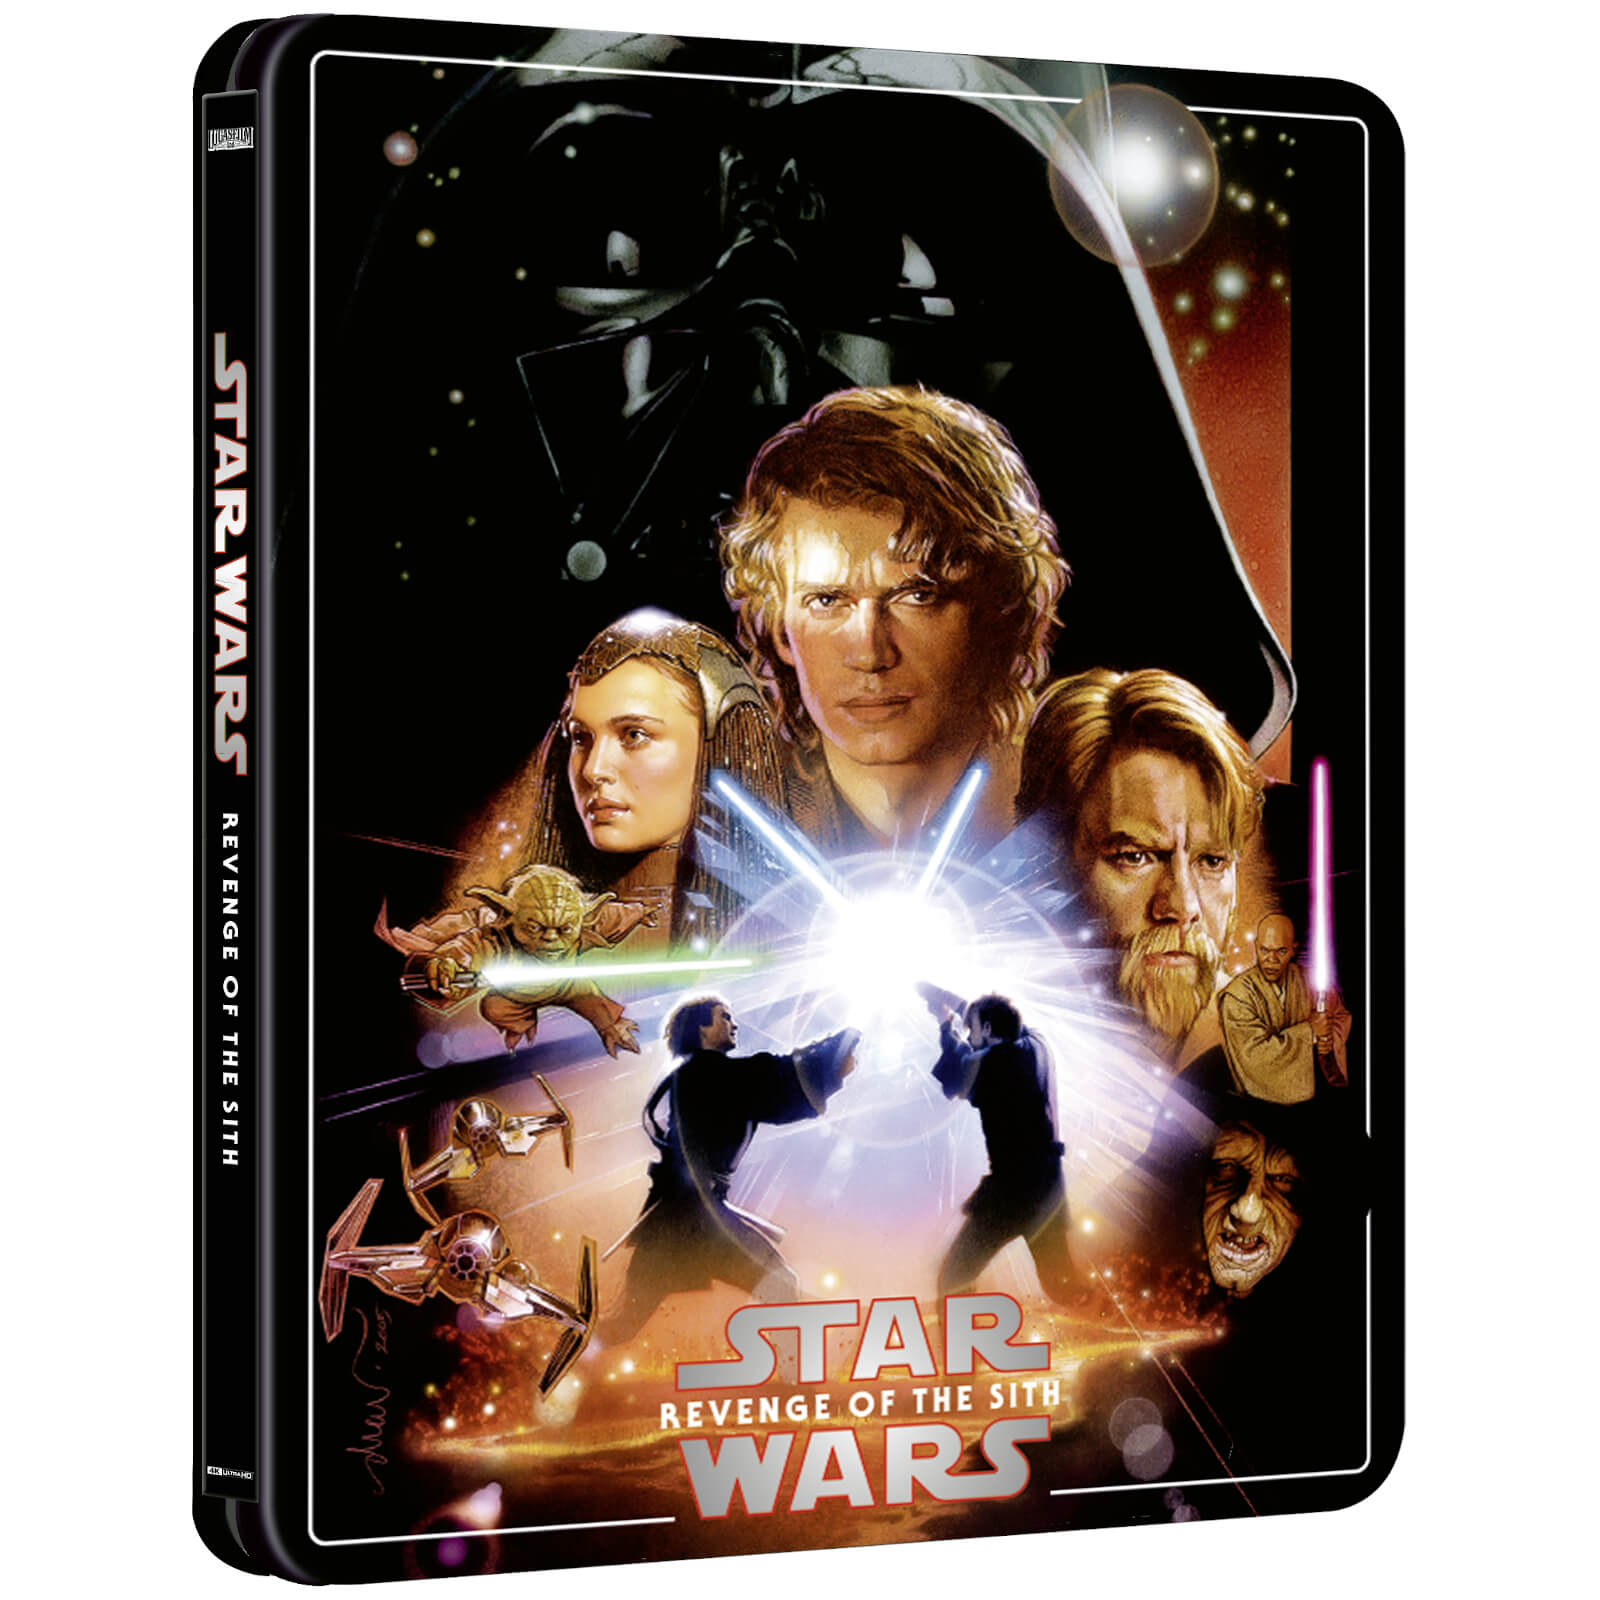 Star Wars Episode Iii Revenge Of The Sith Zavvi Exclusive 4k Ultra Hd Steelbook 3 Disc Edition Includes Blu Ray Blu Ray Zavvi Uk